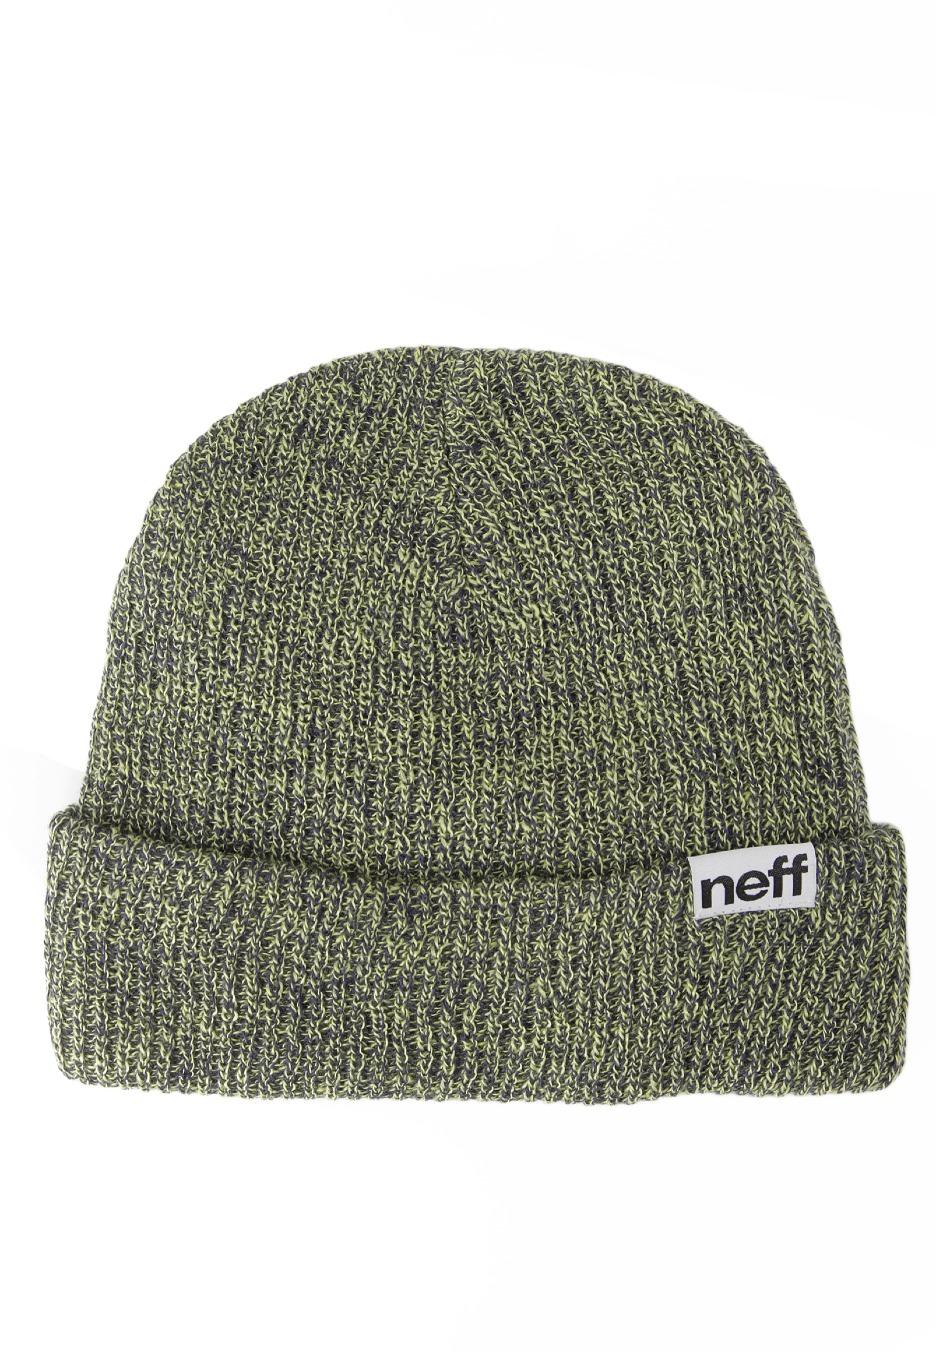 77b8019aa05 Neff - Fold Heather Navy Lime - Beanie - Streetwear Shop - Impericon.com UK